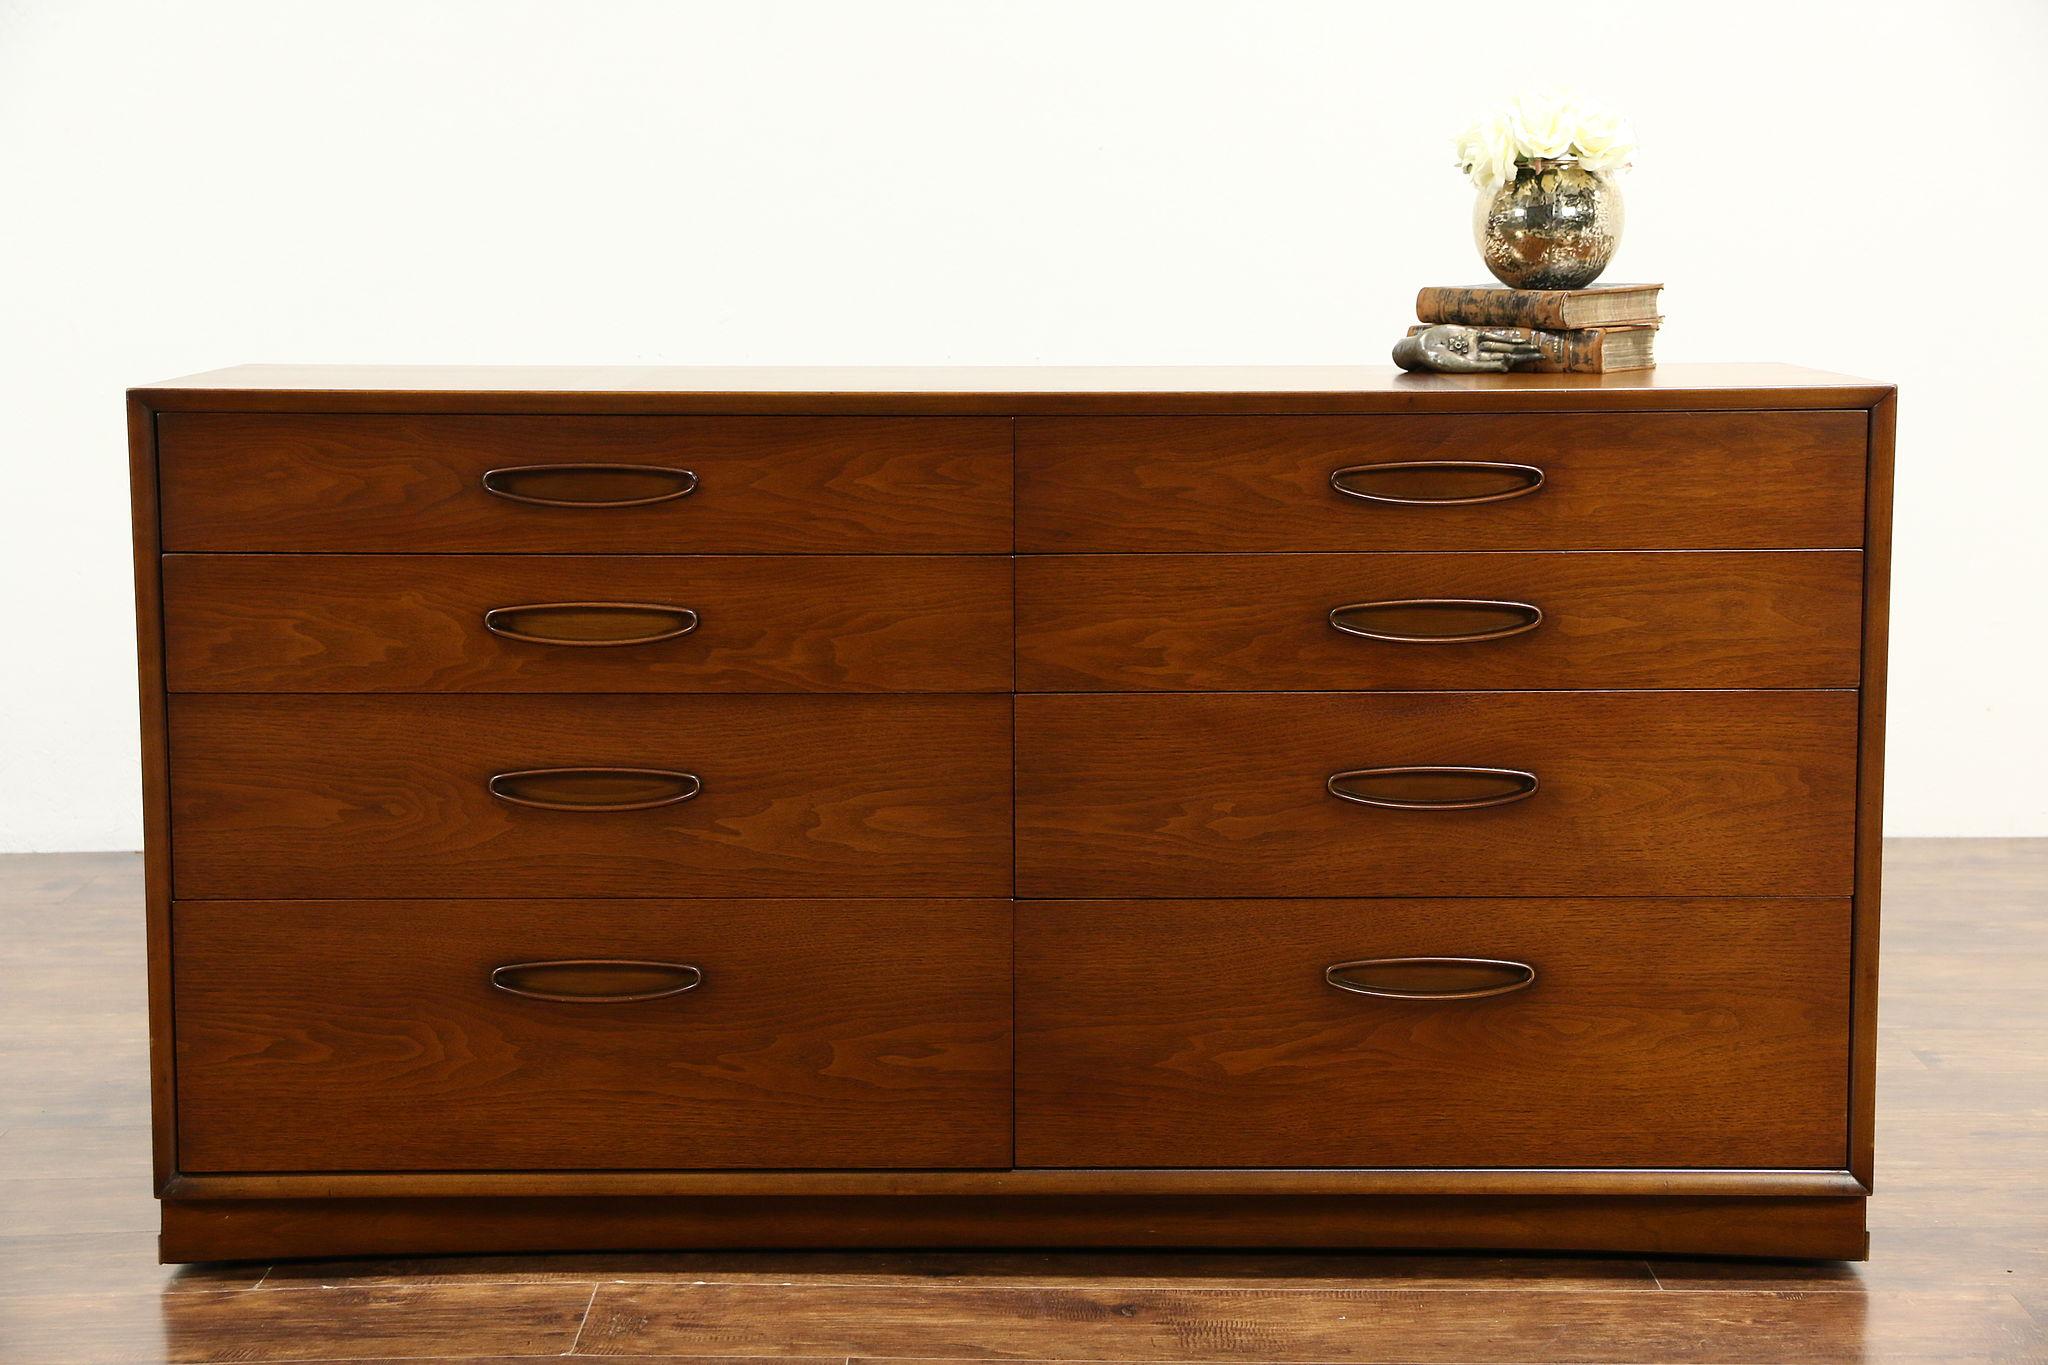 Sold Teak Midcentury Modern 1960 Vintage Dresser Or Chest Signed Henredon Harp Gallery